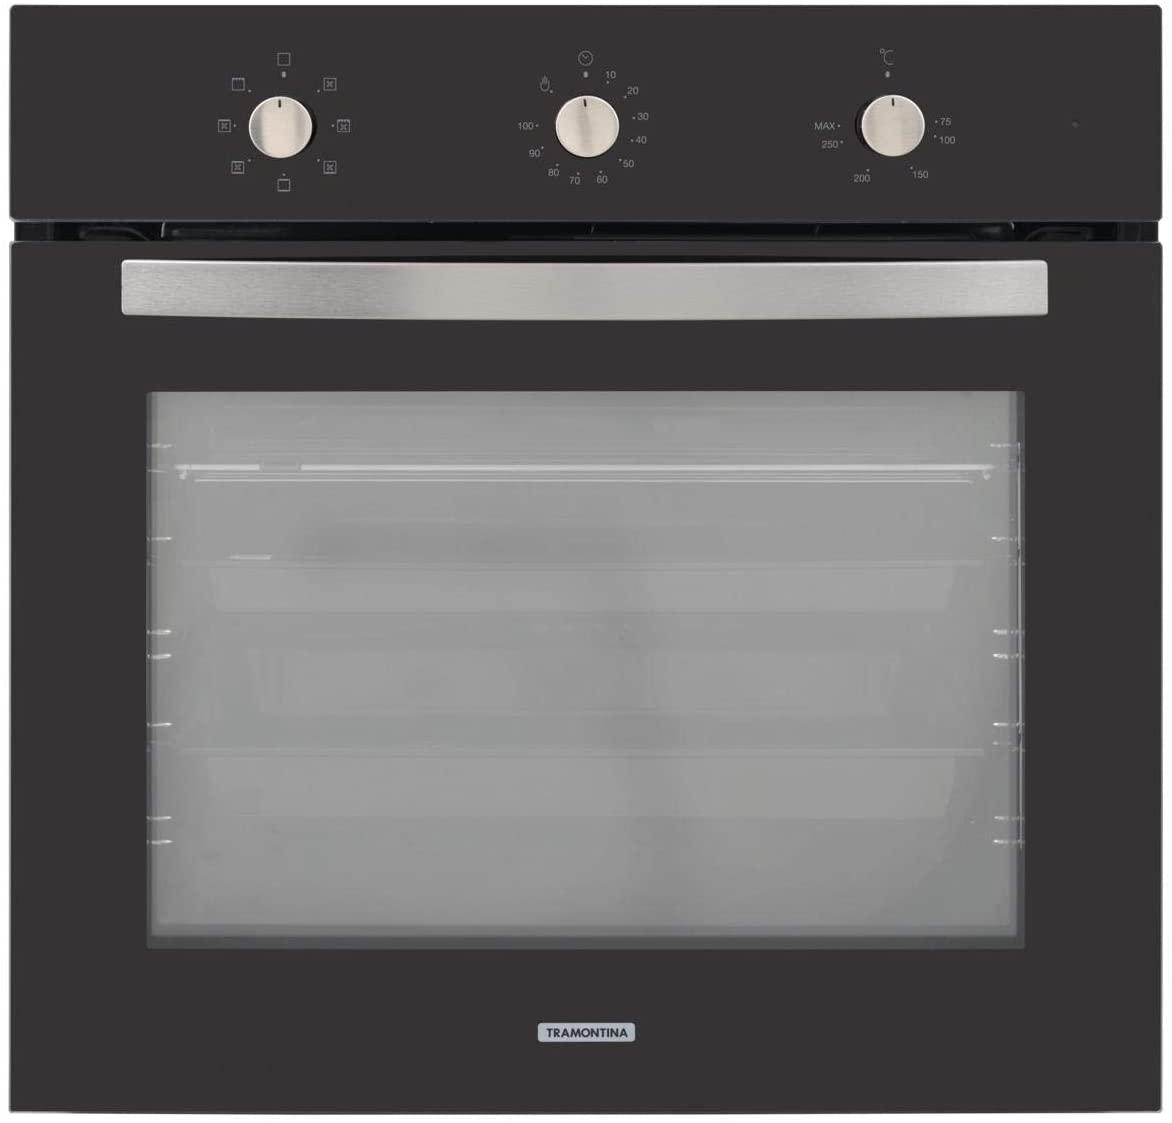 Forno Elétrico De Embutir New Glass Cook Tramontina 94867/220